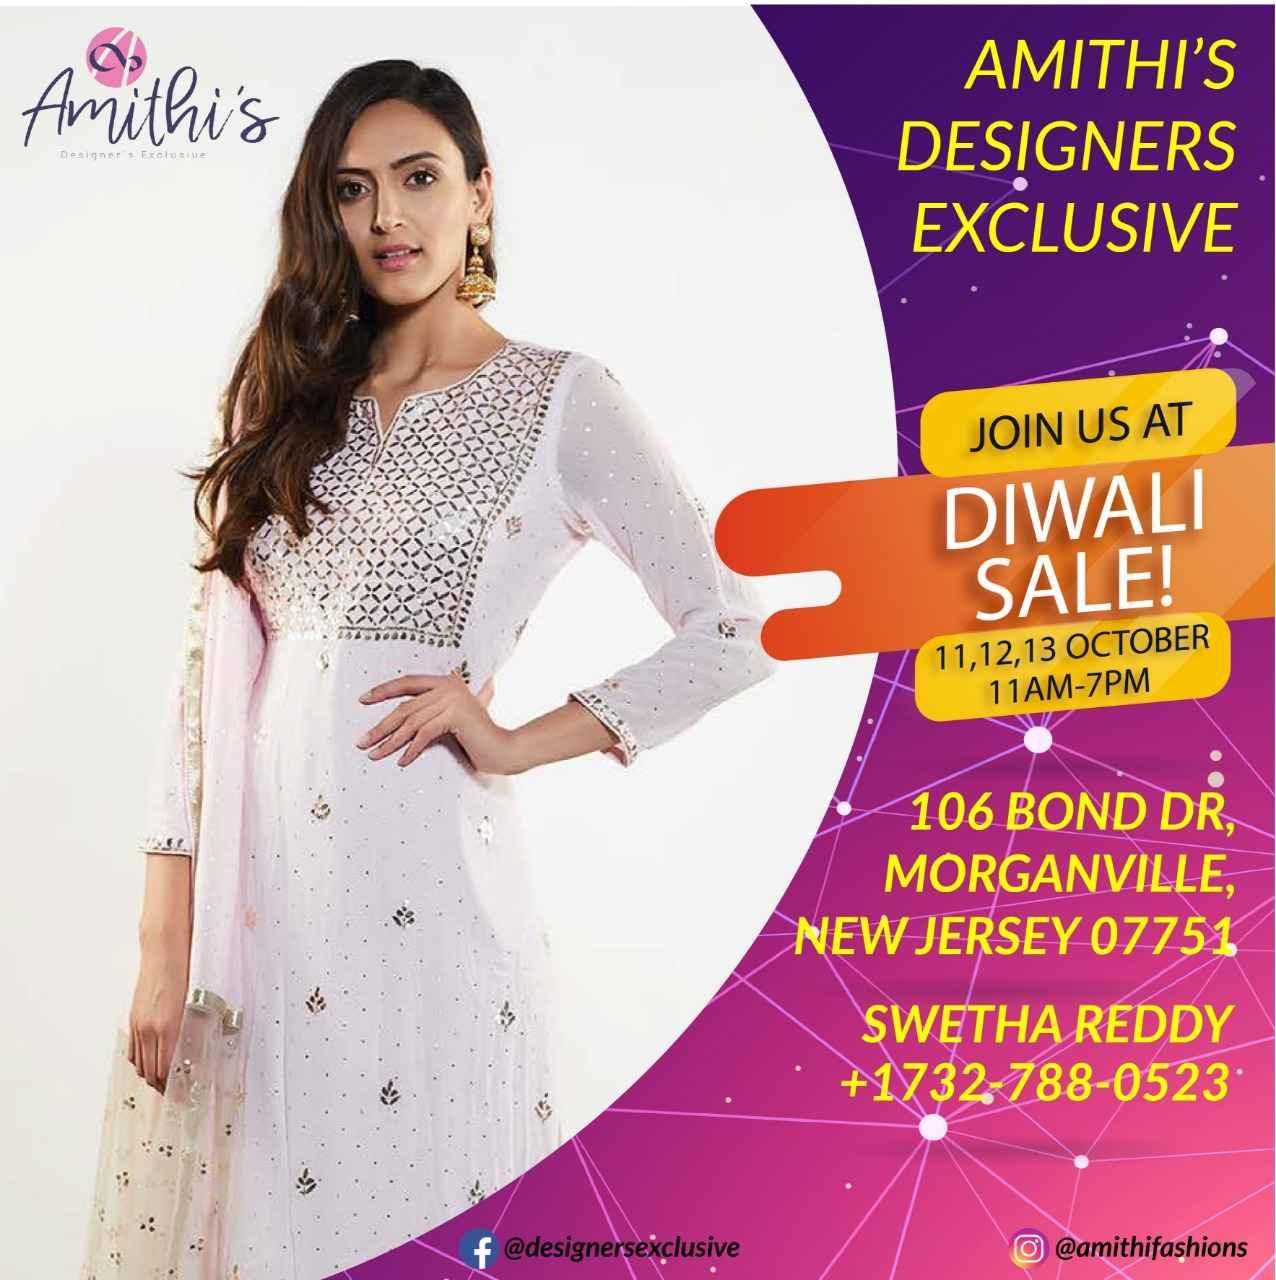 AMITHI'S DESIGNERS EXCLUSIVE